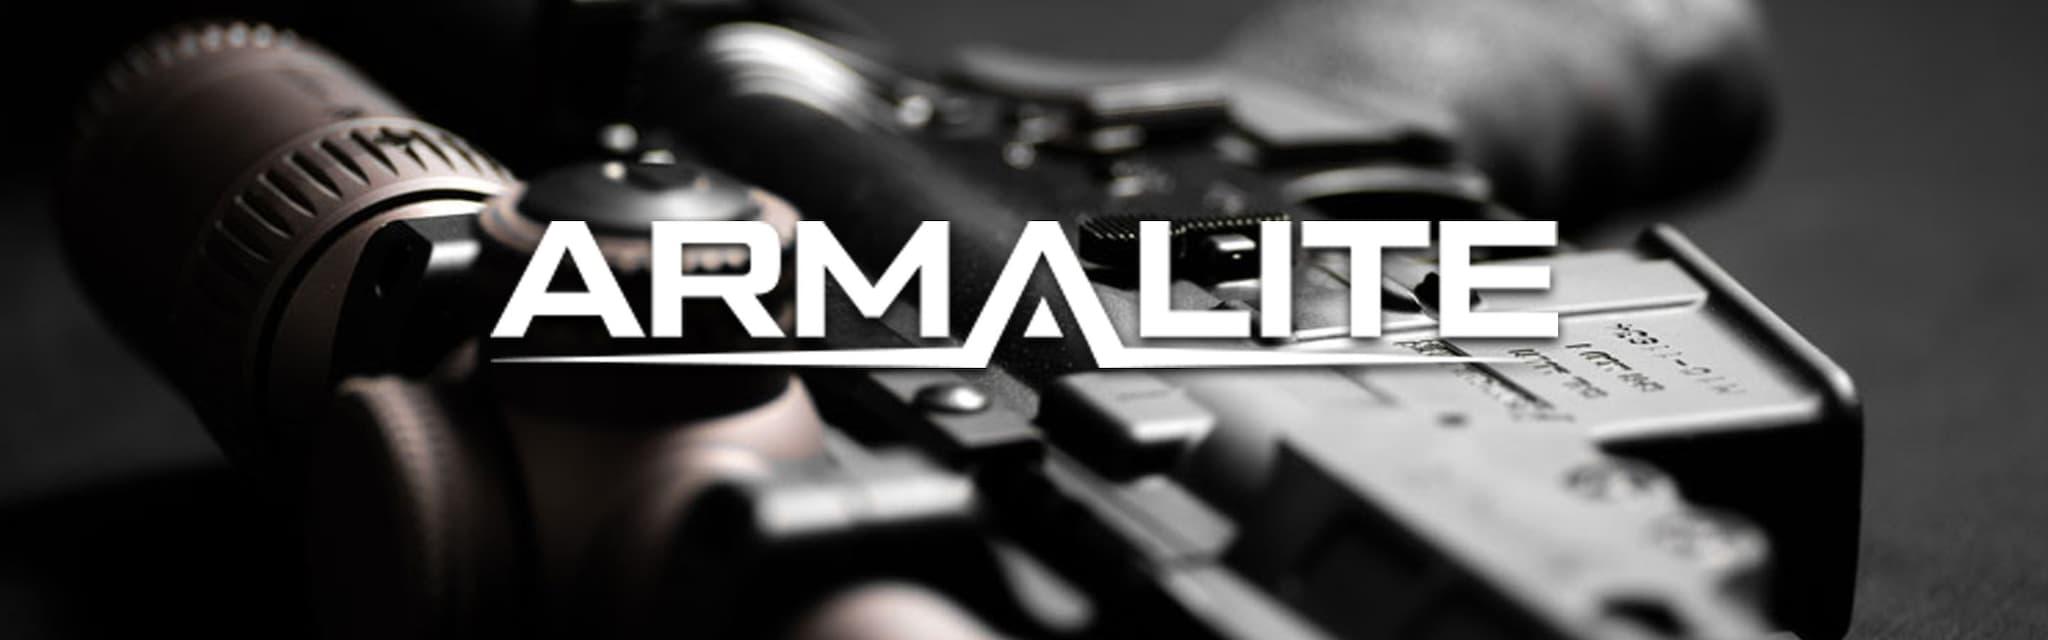 Armalite Brand Page